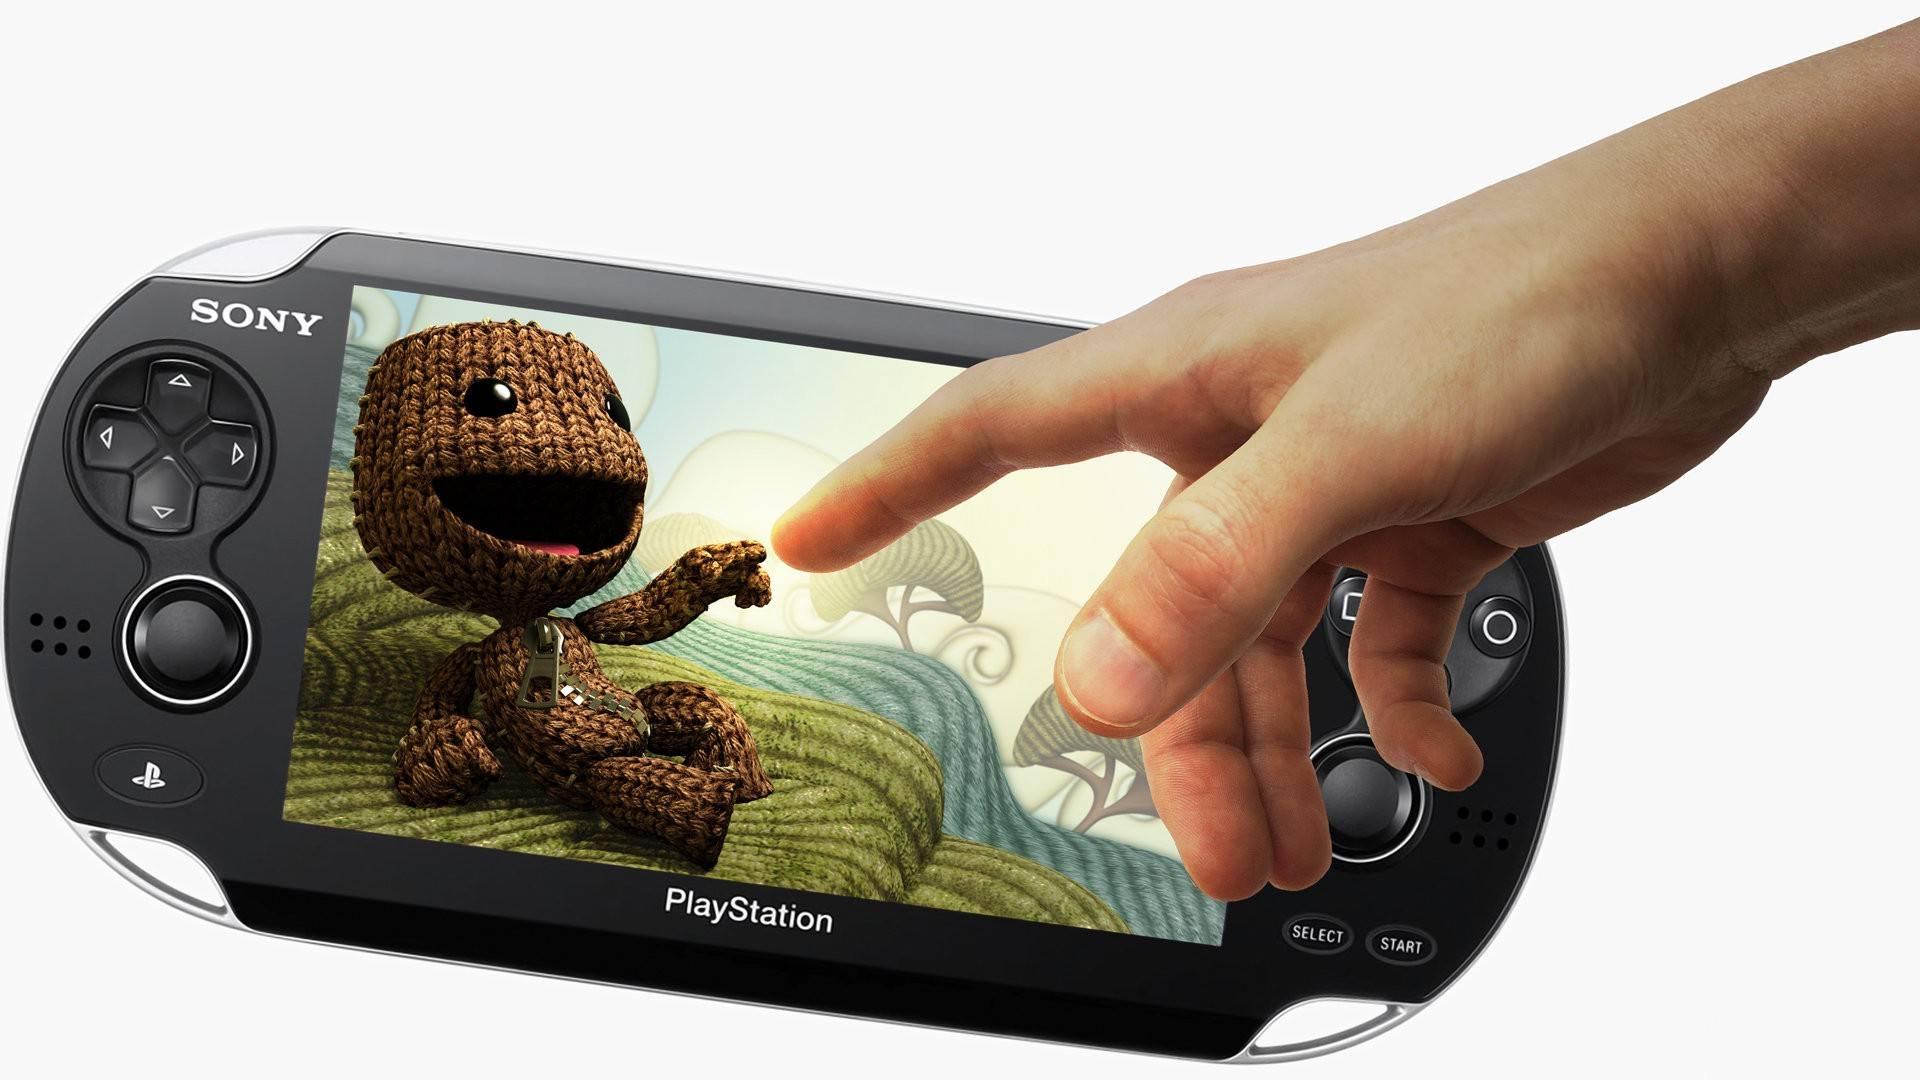 PlayStation Vita PS Vita